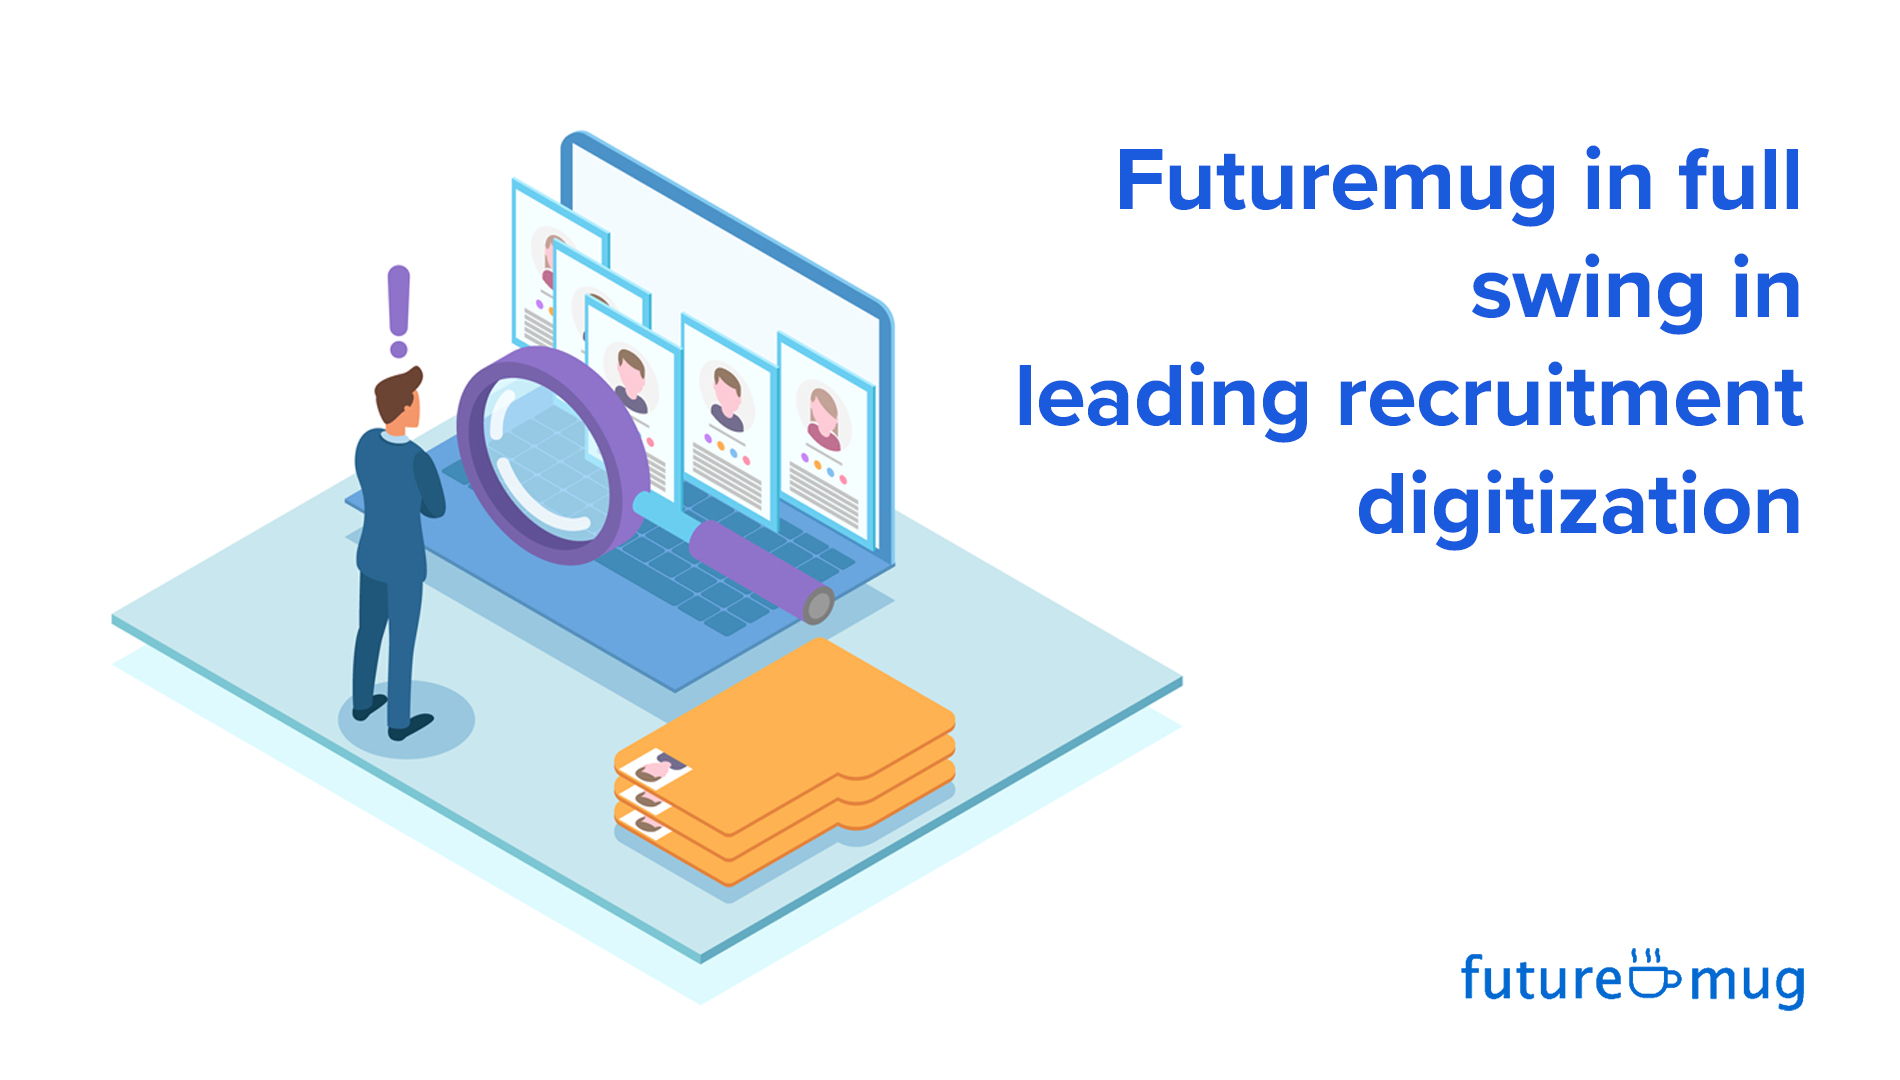 Futuremug leads the way